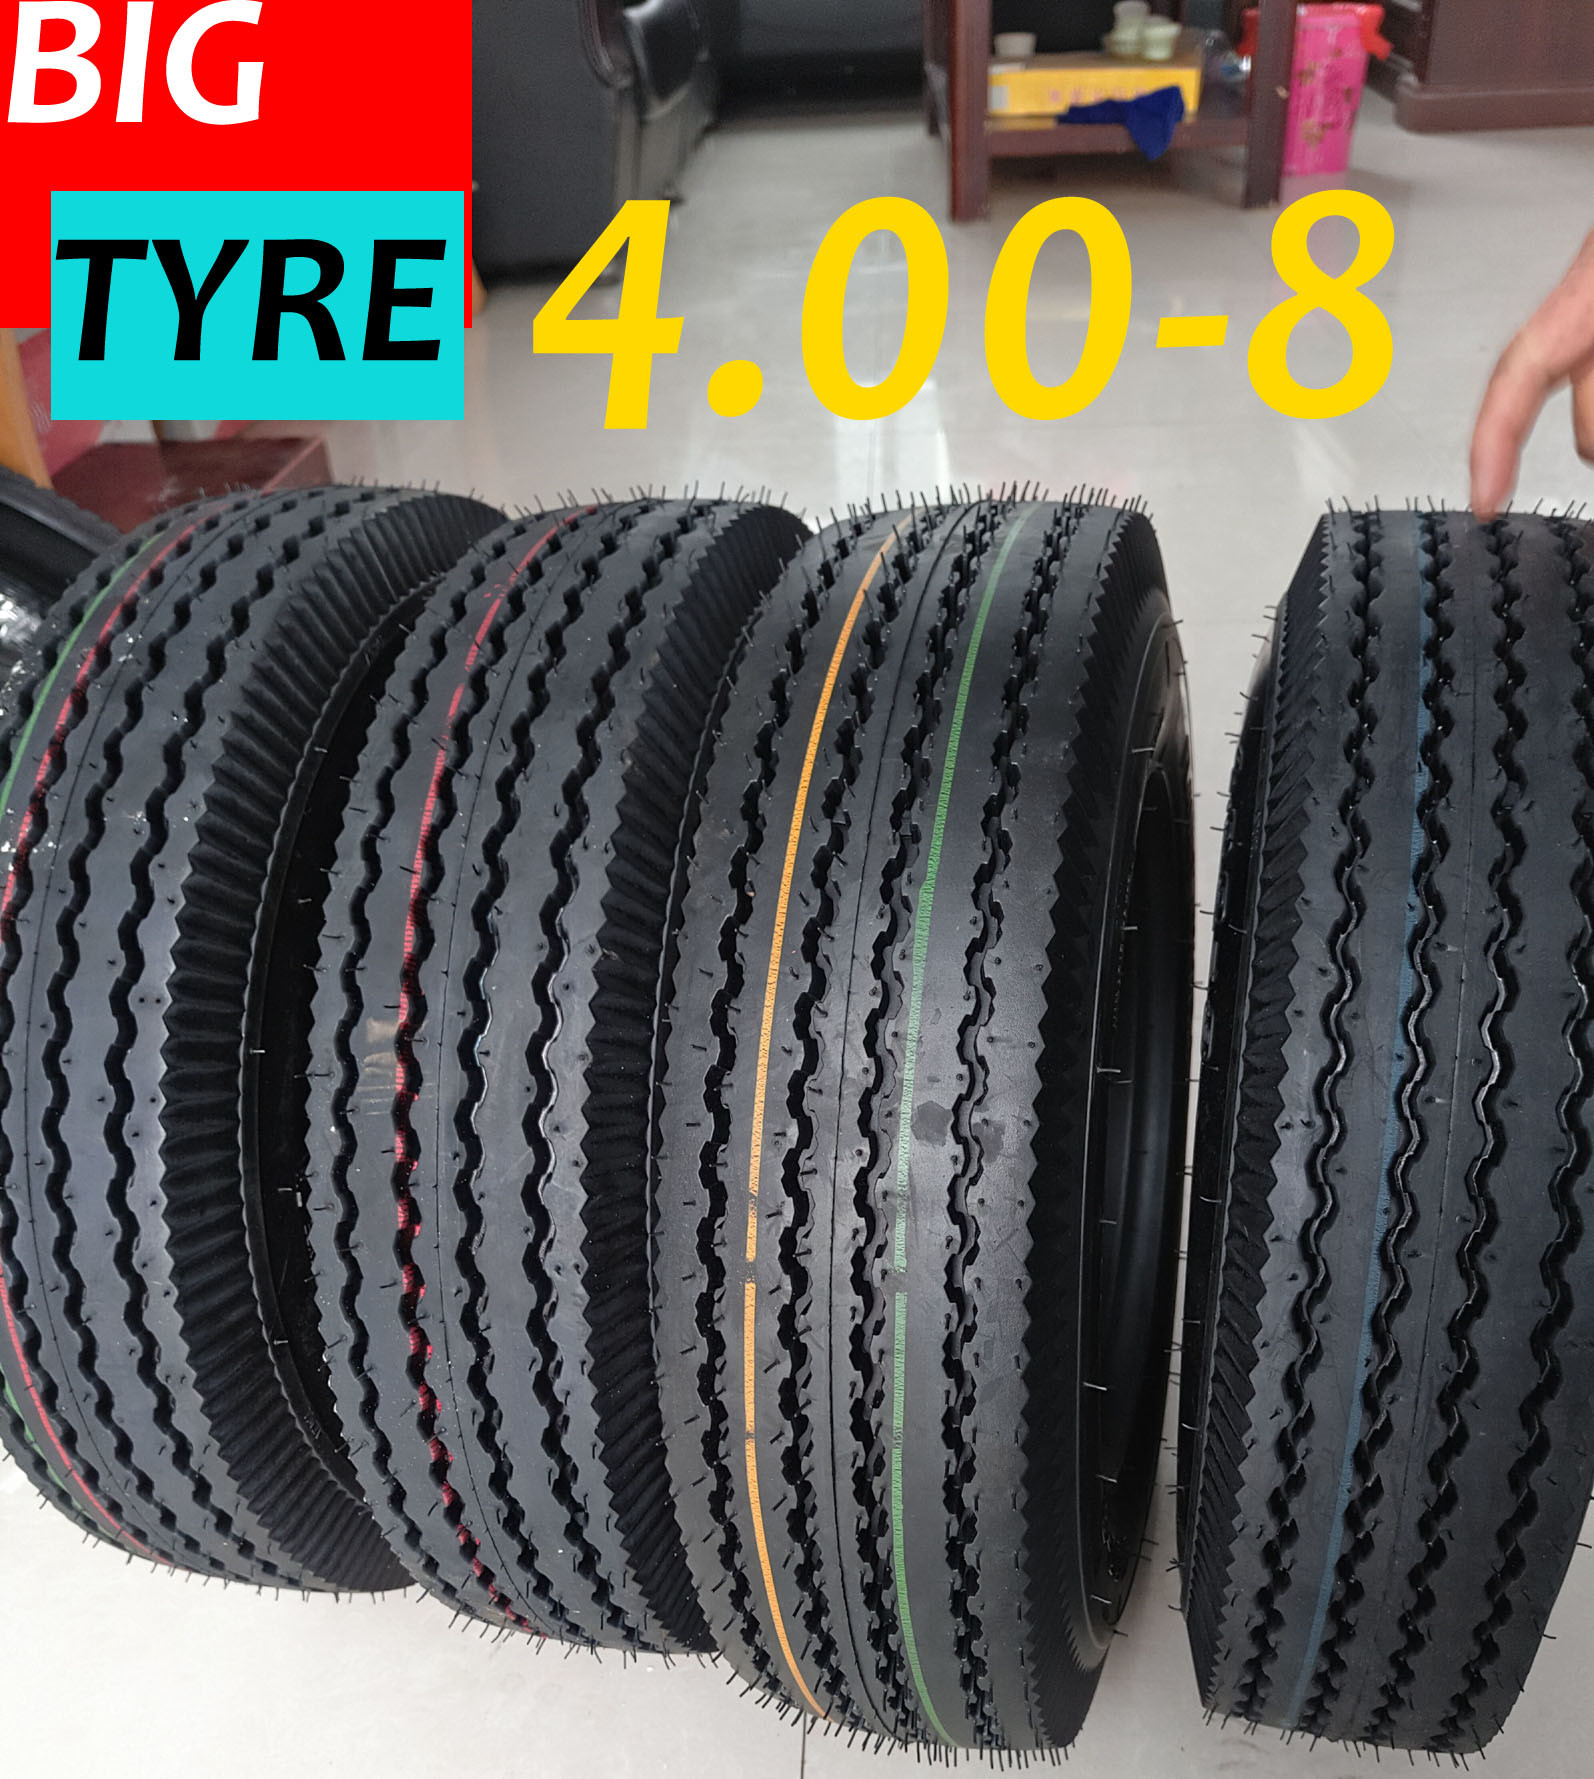 Mrf Pattern Tuktuk Tyre Tricycle Tyre Three Wheeler Tyre 4.00-8 4.00-12 4.50-12 5.00-12